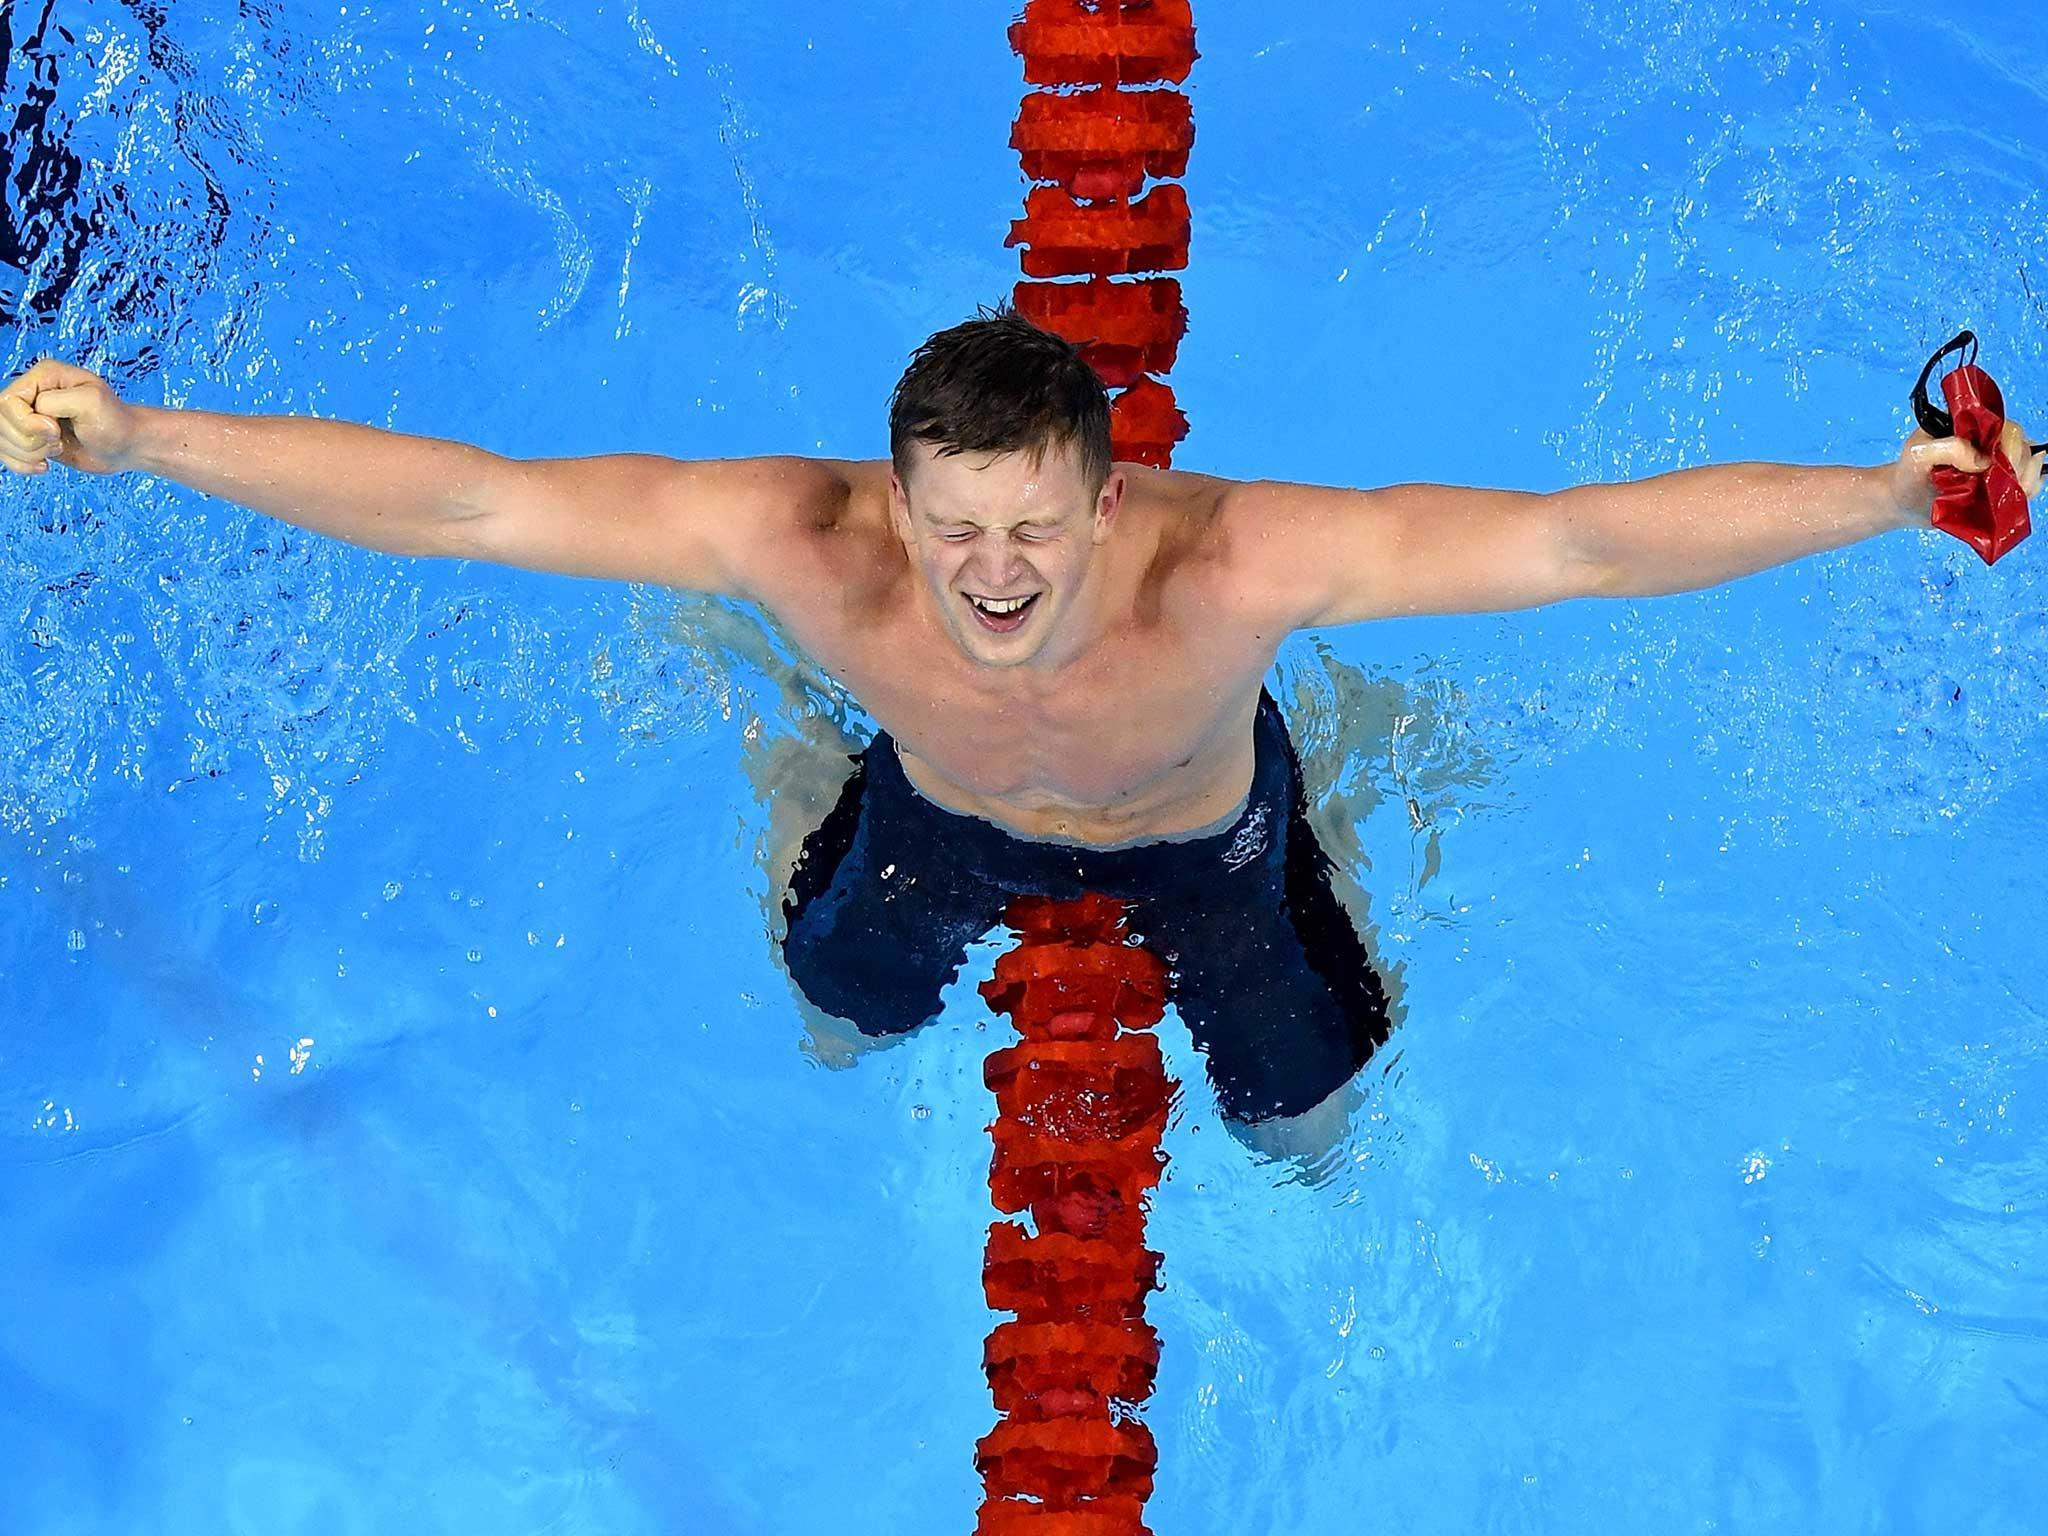 Adam Peaty celebrates his record-breaking gold medal